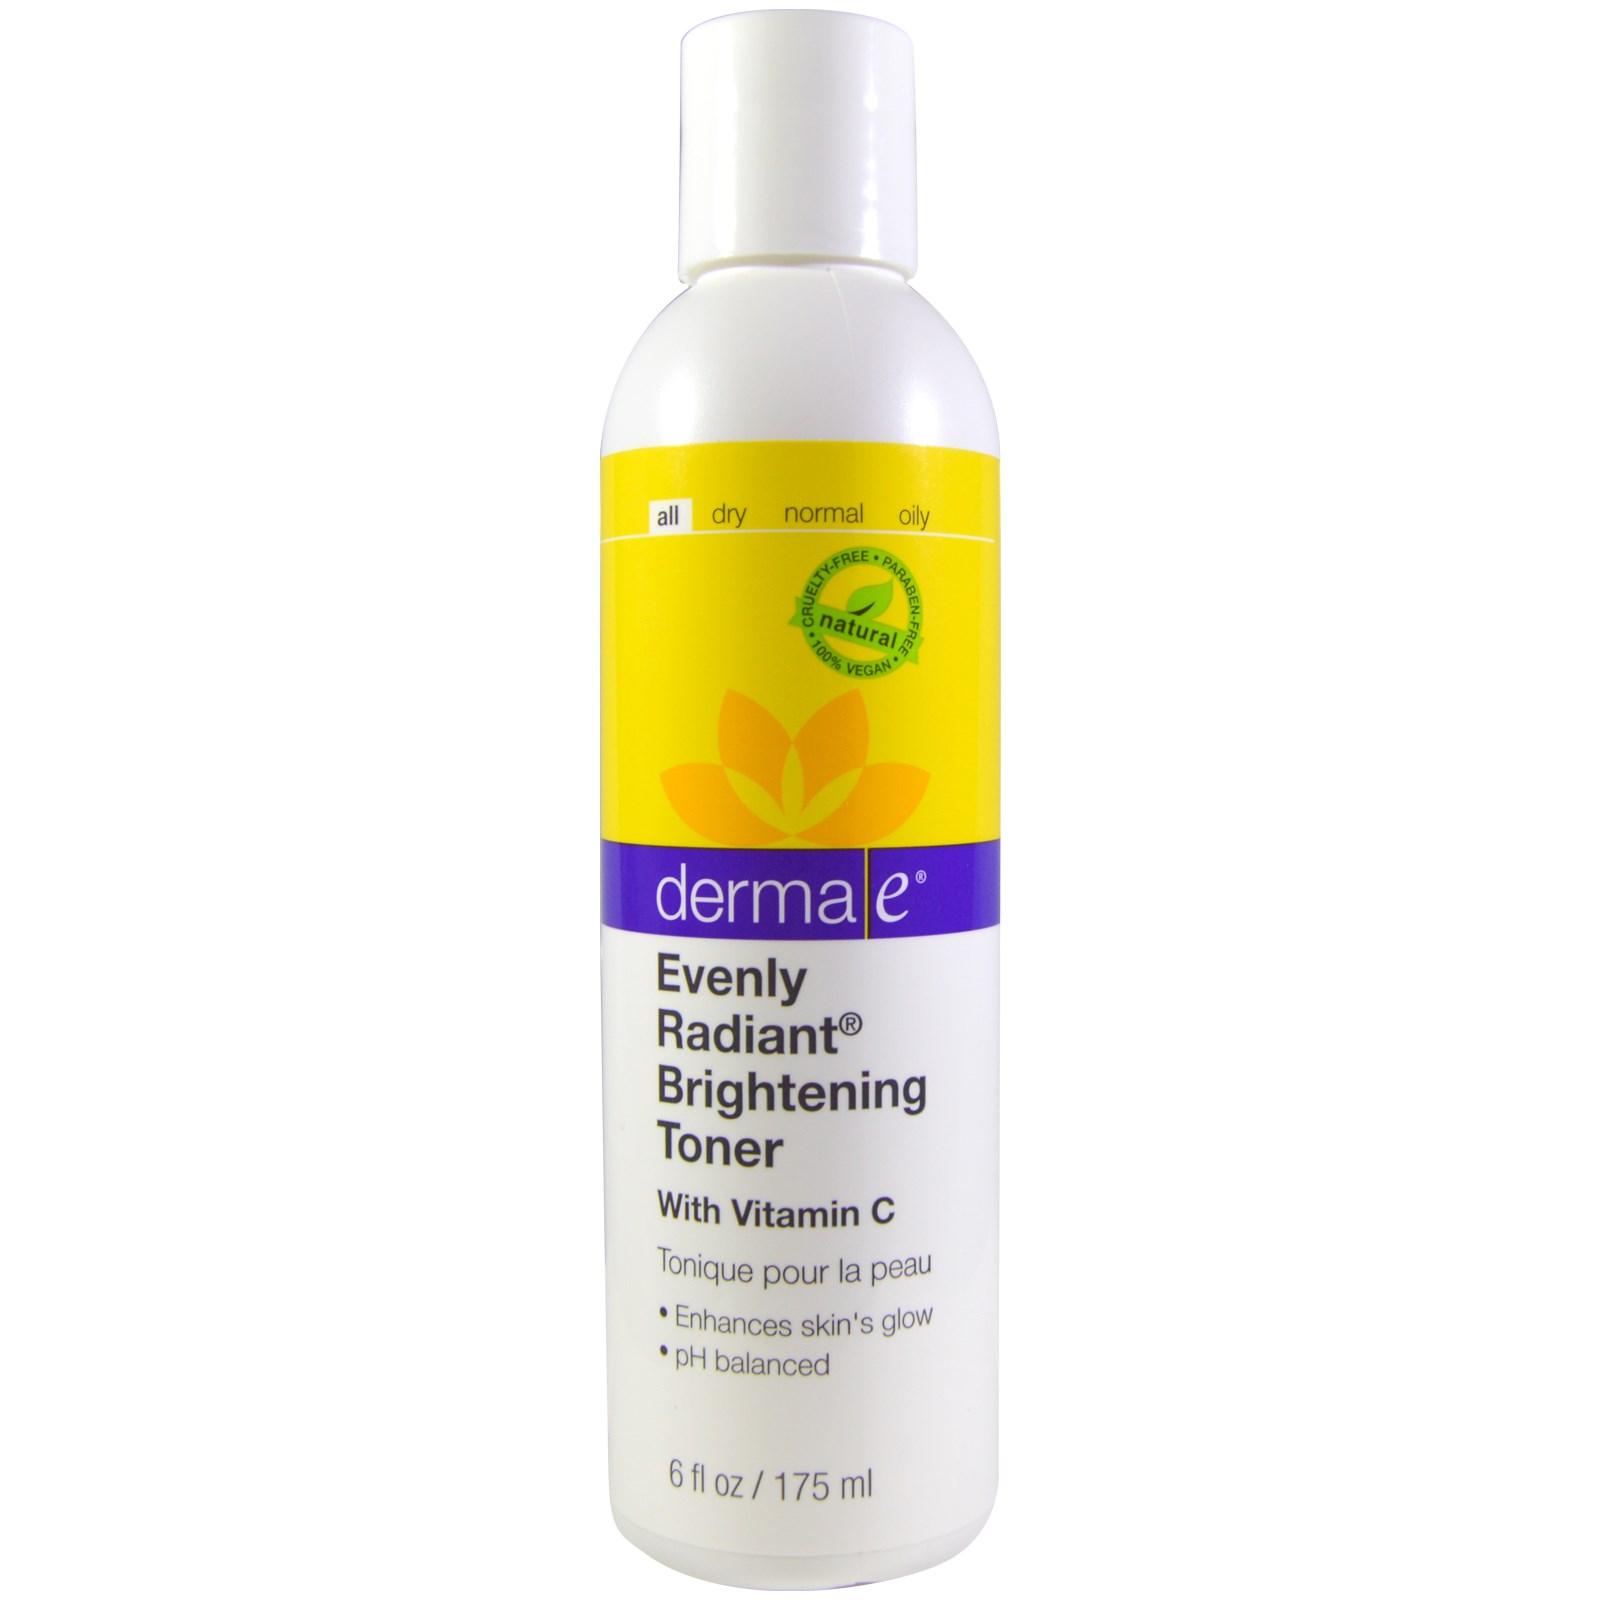 Derma E Evenly Radiant Brightening Serum 60ml/2oz Premium New Womens Deep Pore Facial Cleanser Clear Skin Helps Breakouts Facial Cleanser Machine -4